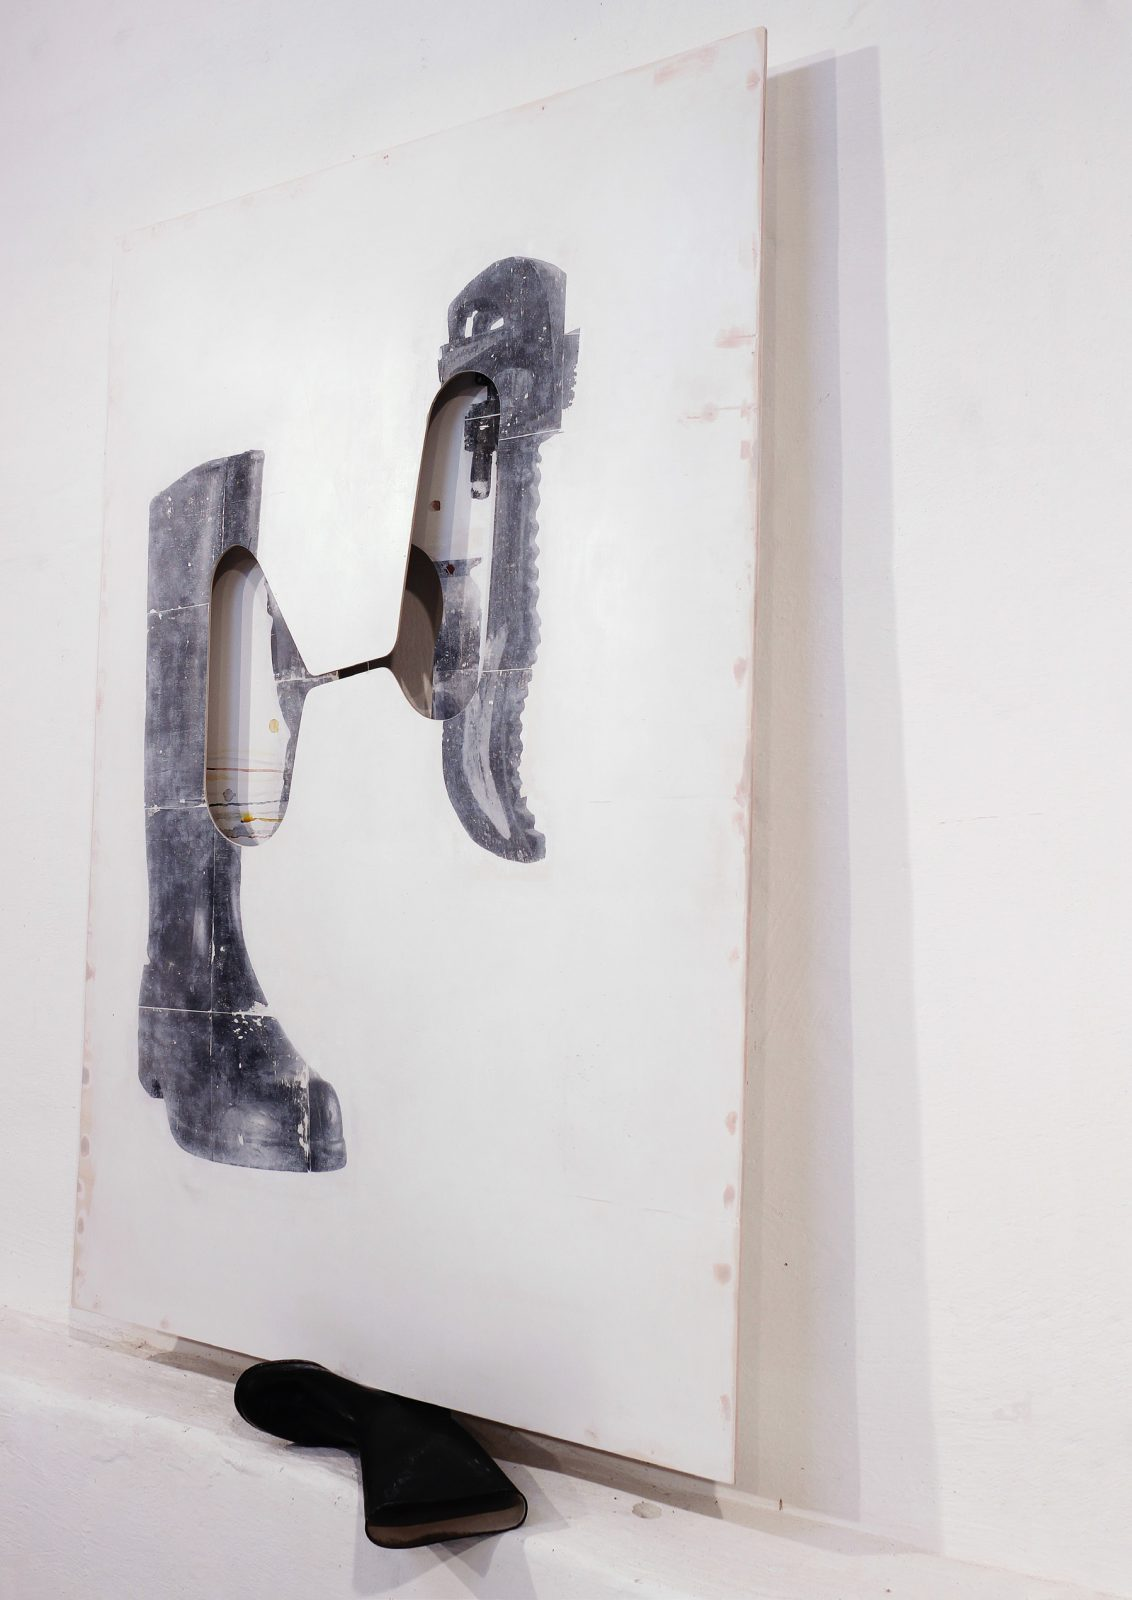 NÖ Waldviertel Galerie Kunst - Johannes Heuer